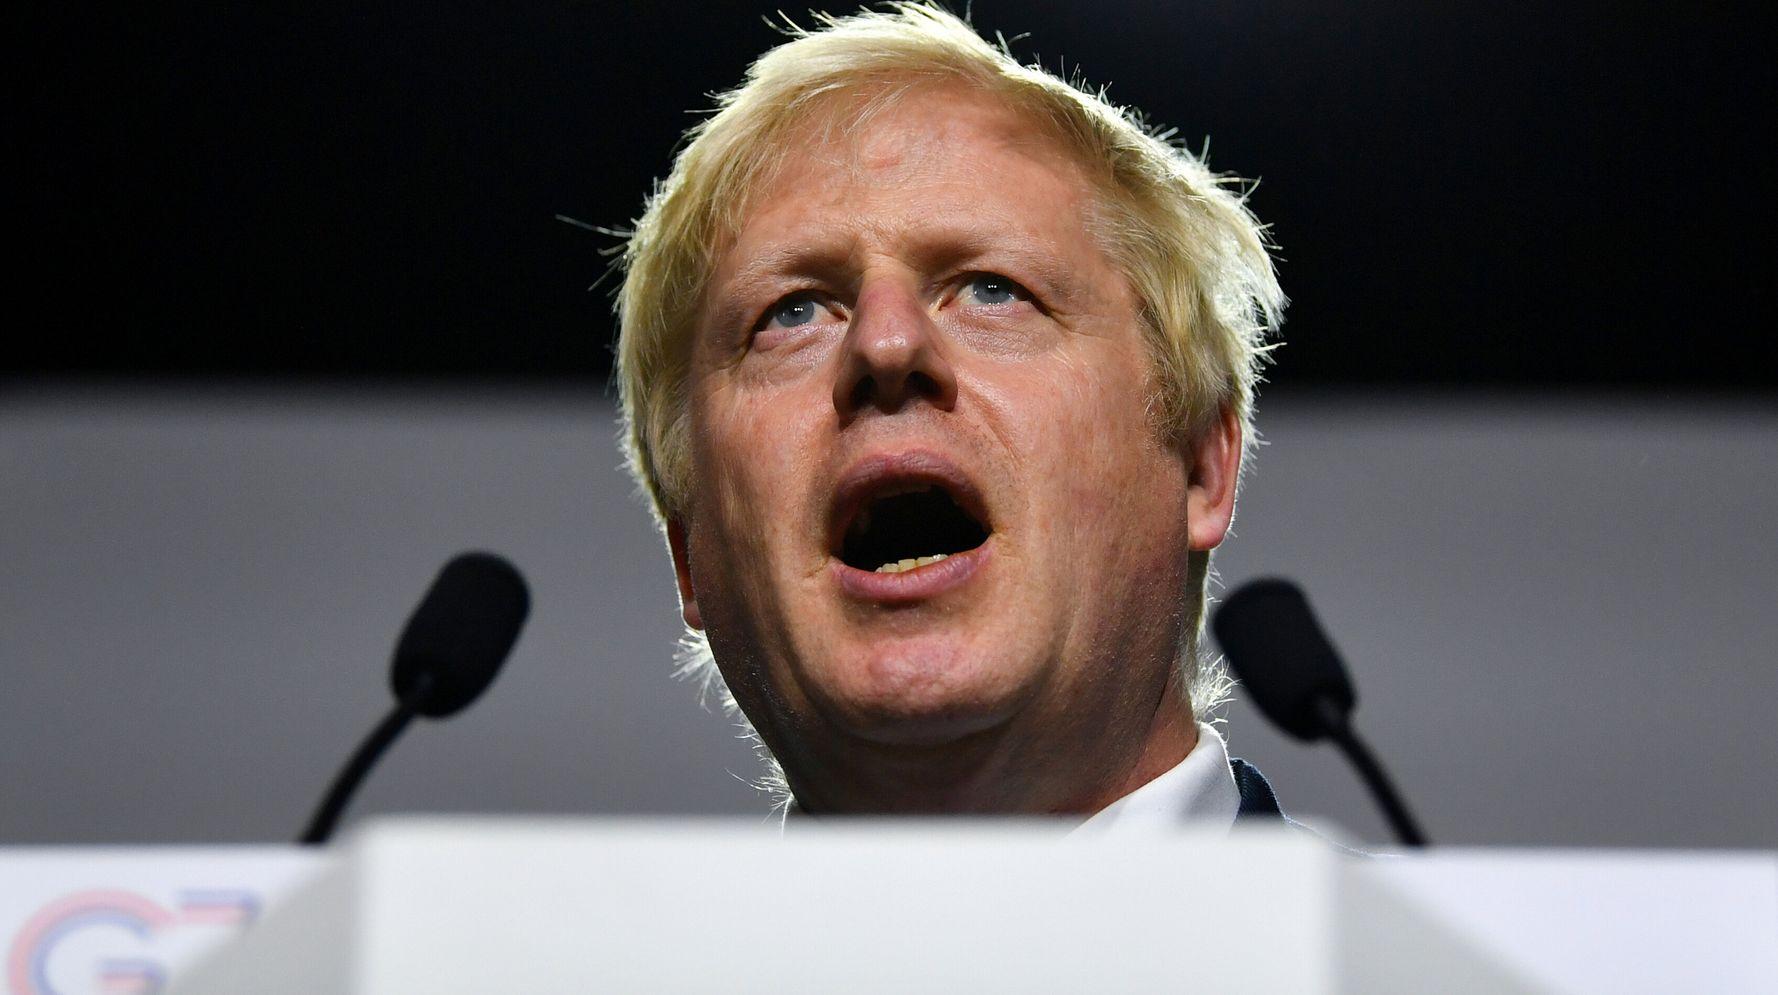 Westlake Legal Group 5d68df77250000340089a9fc Legal Bid To Block Boris Johnson's Parliament Suspension Fails